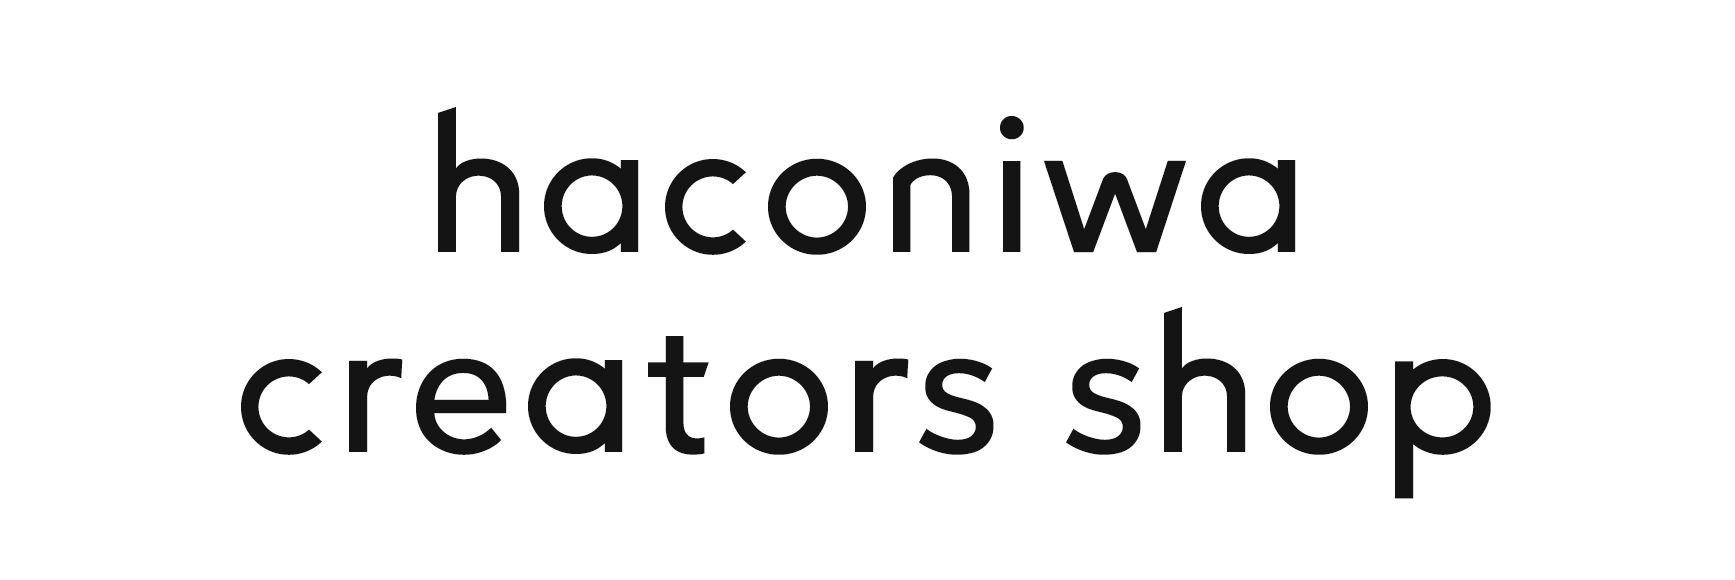 haconiwa creators shop